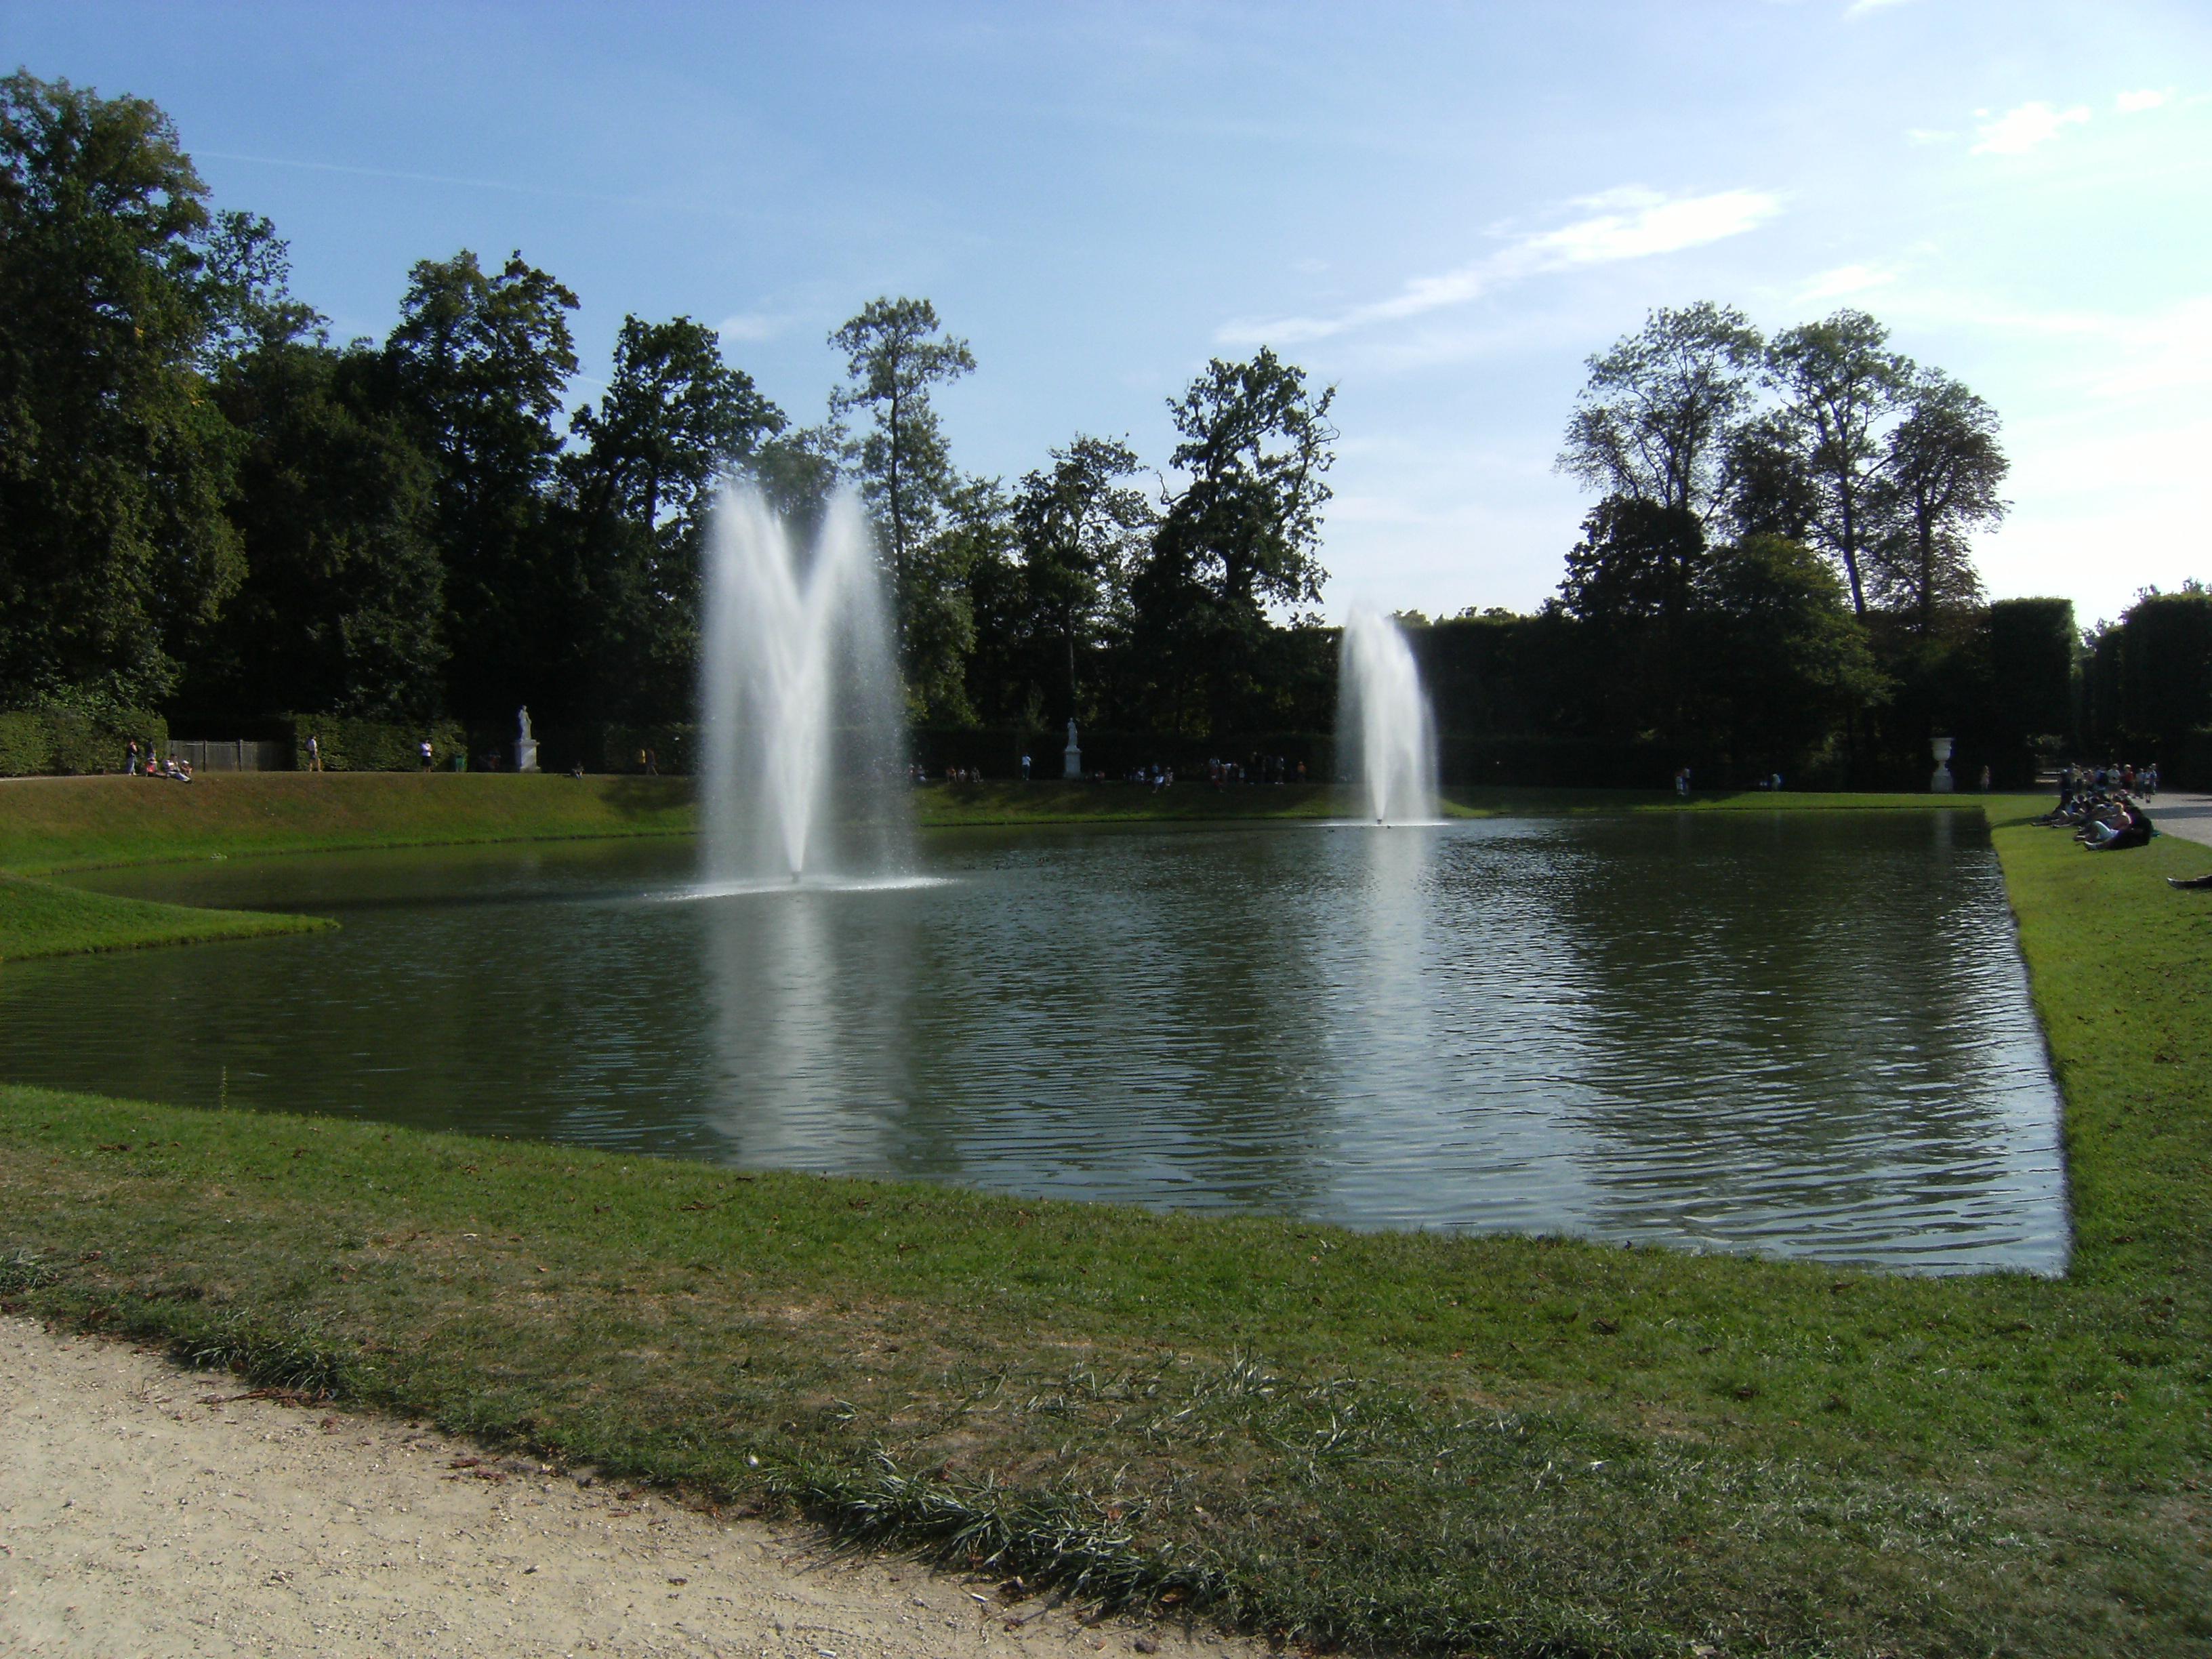 bassin du miroir ch teau de versailles nicabou